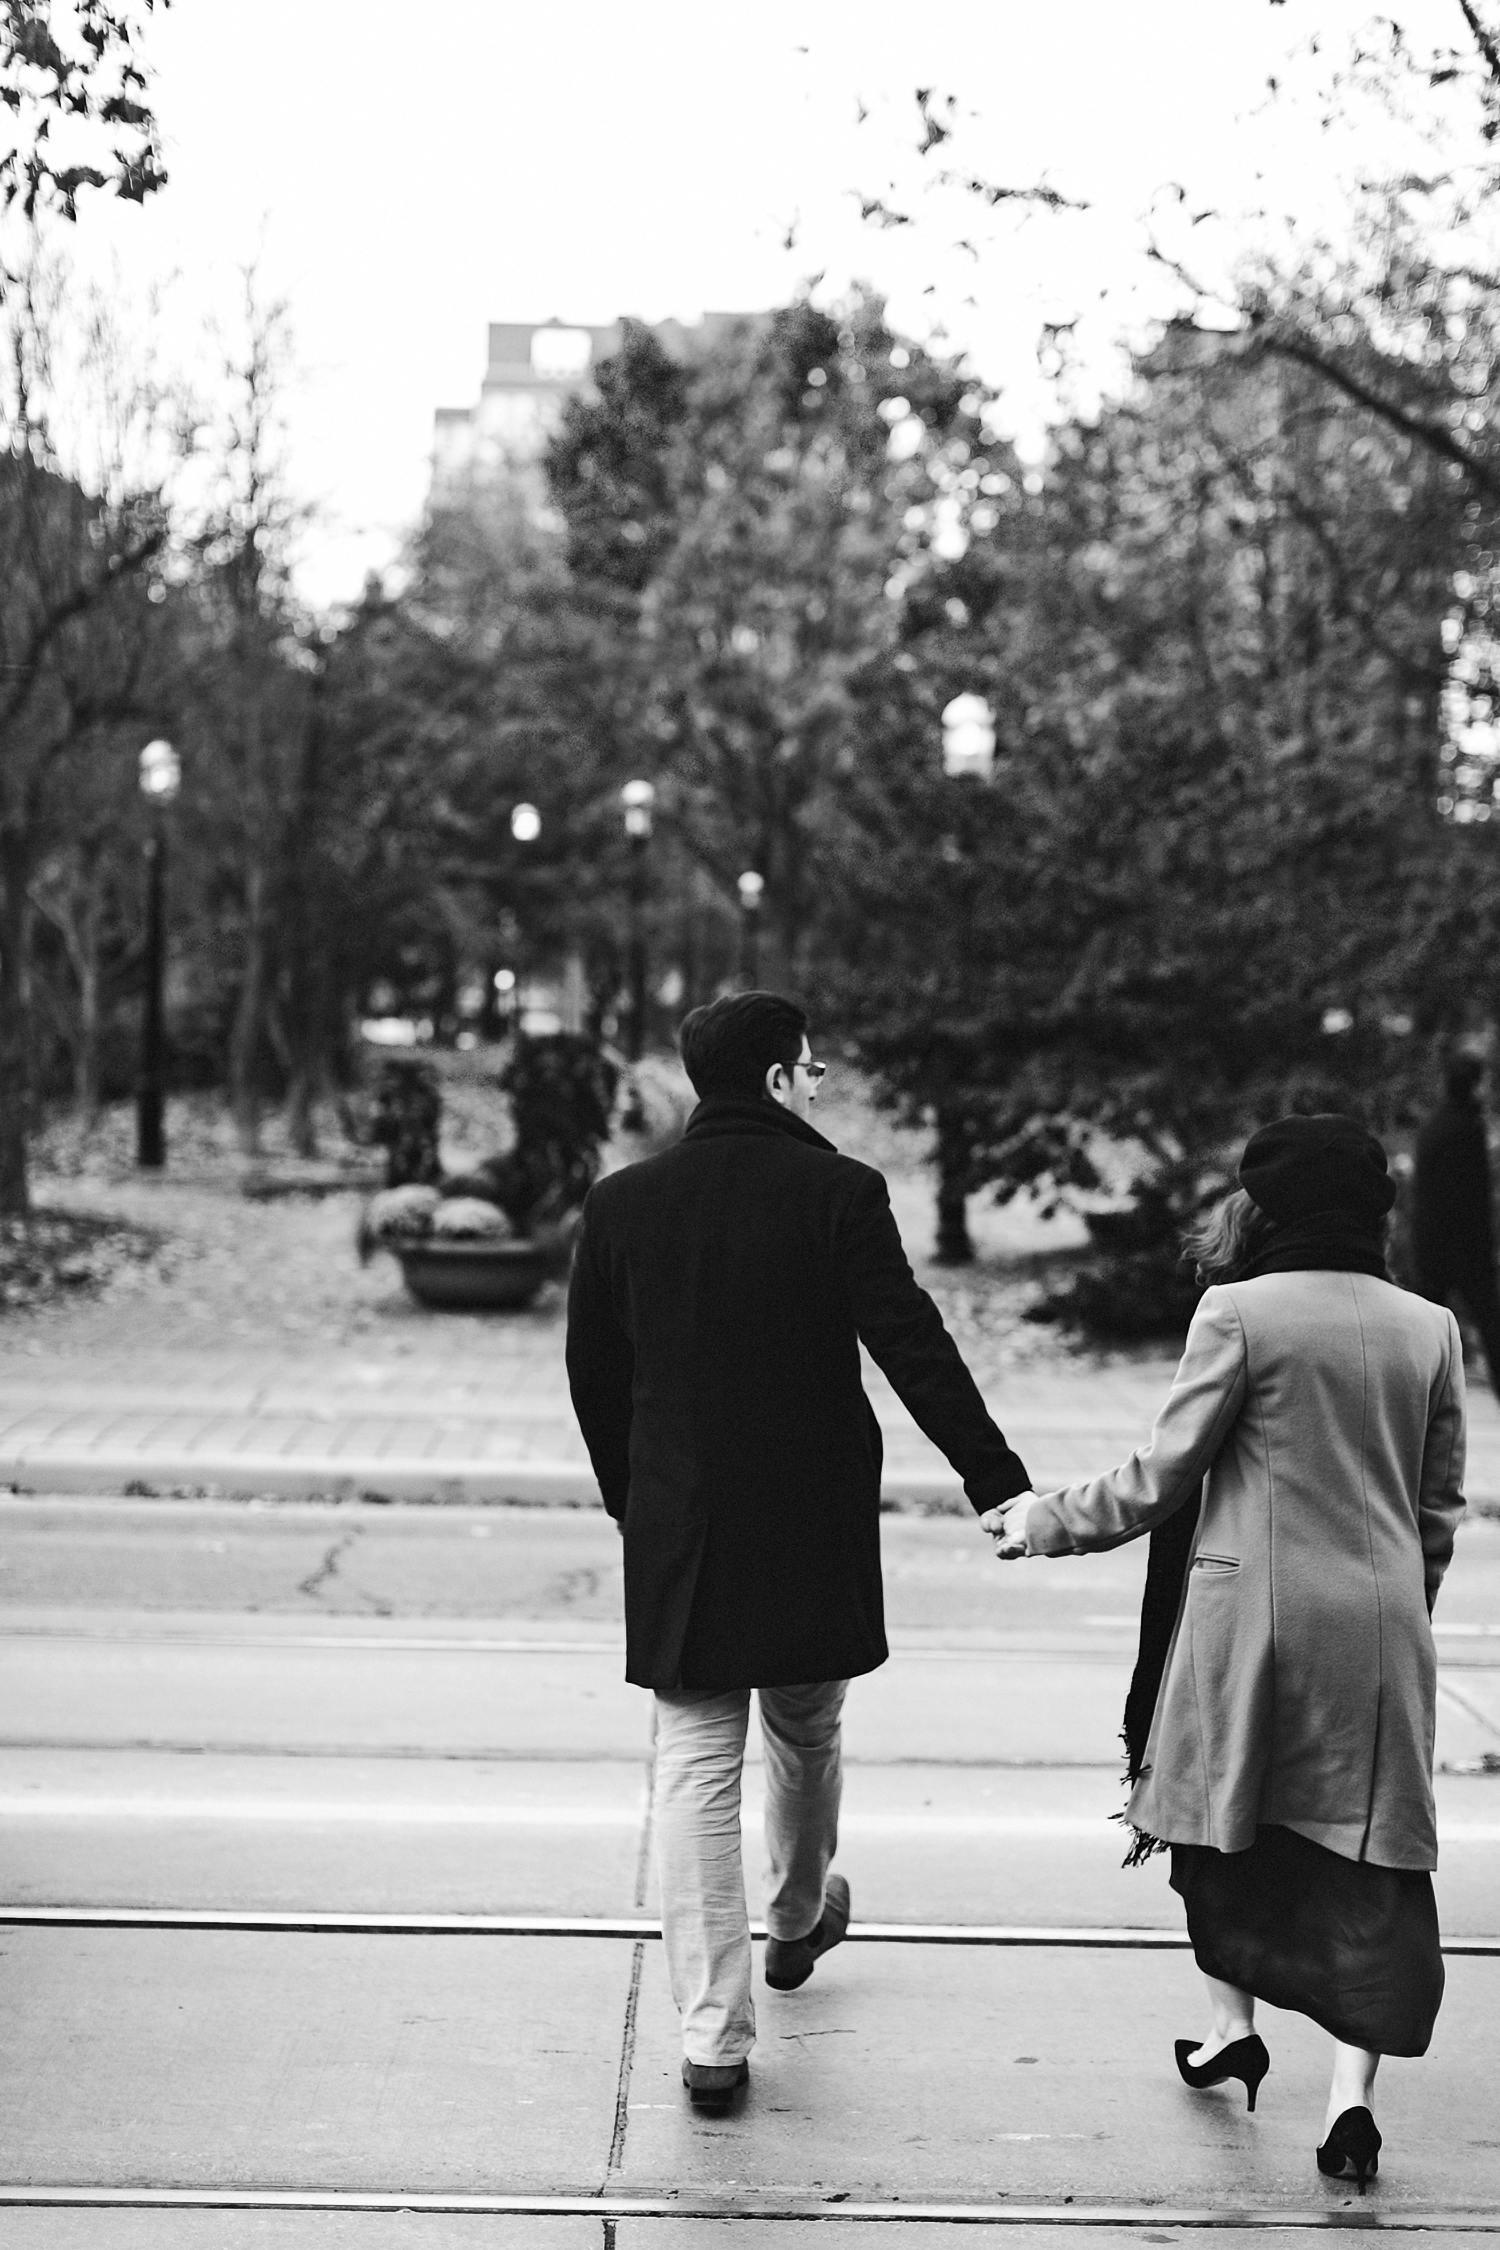 alternative-engagement-photographer-lifestyle-session-ryanne-hollies-photography-toronto-st-james-park-editorial-high-fashion-shoot-city-urban-mens-womens-fashion-magazine-cover-intimate-streetstyle-alternative-walking.jpg